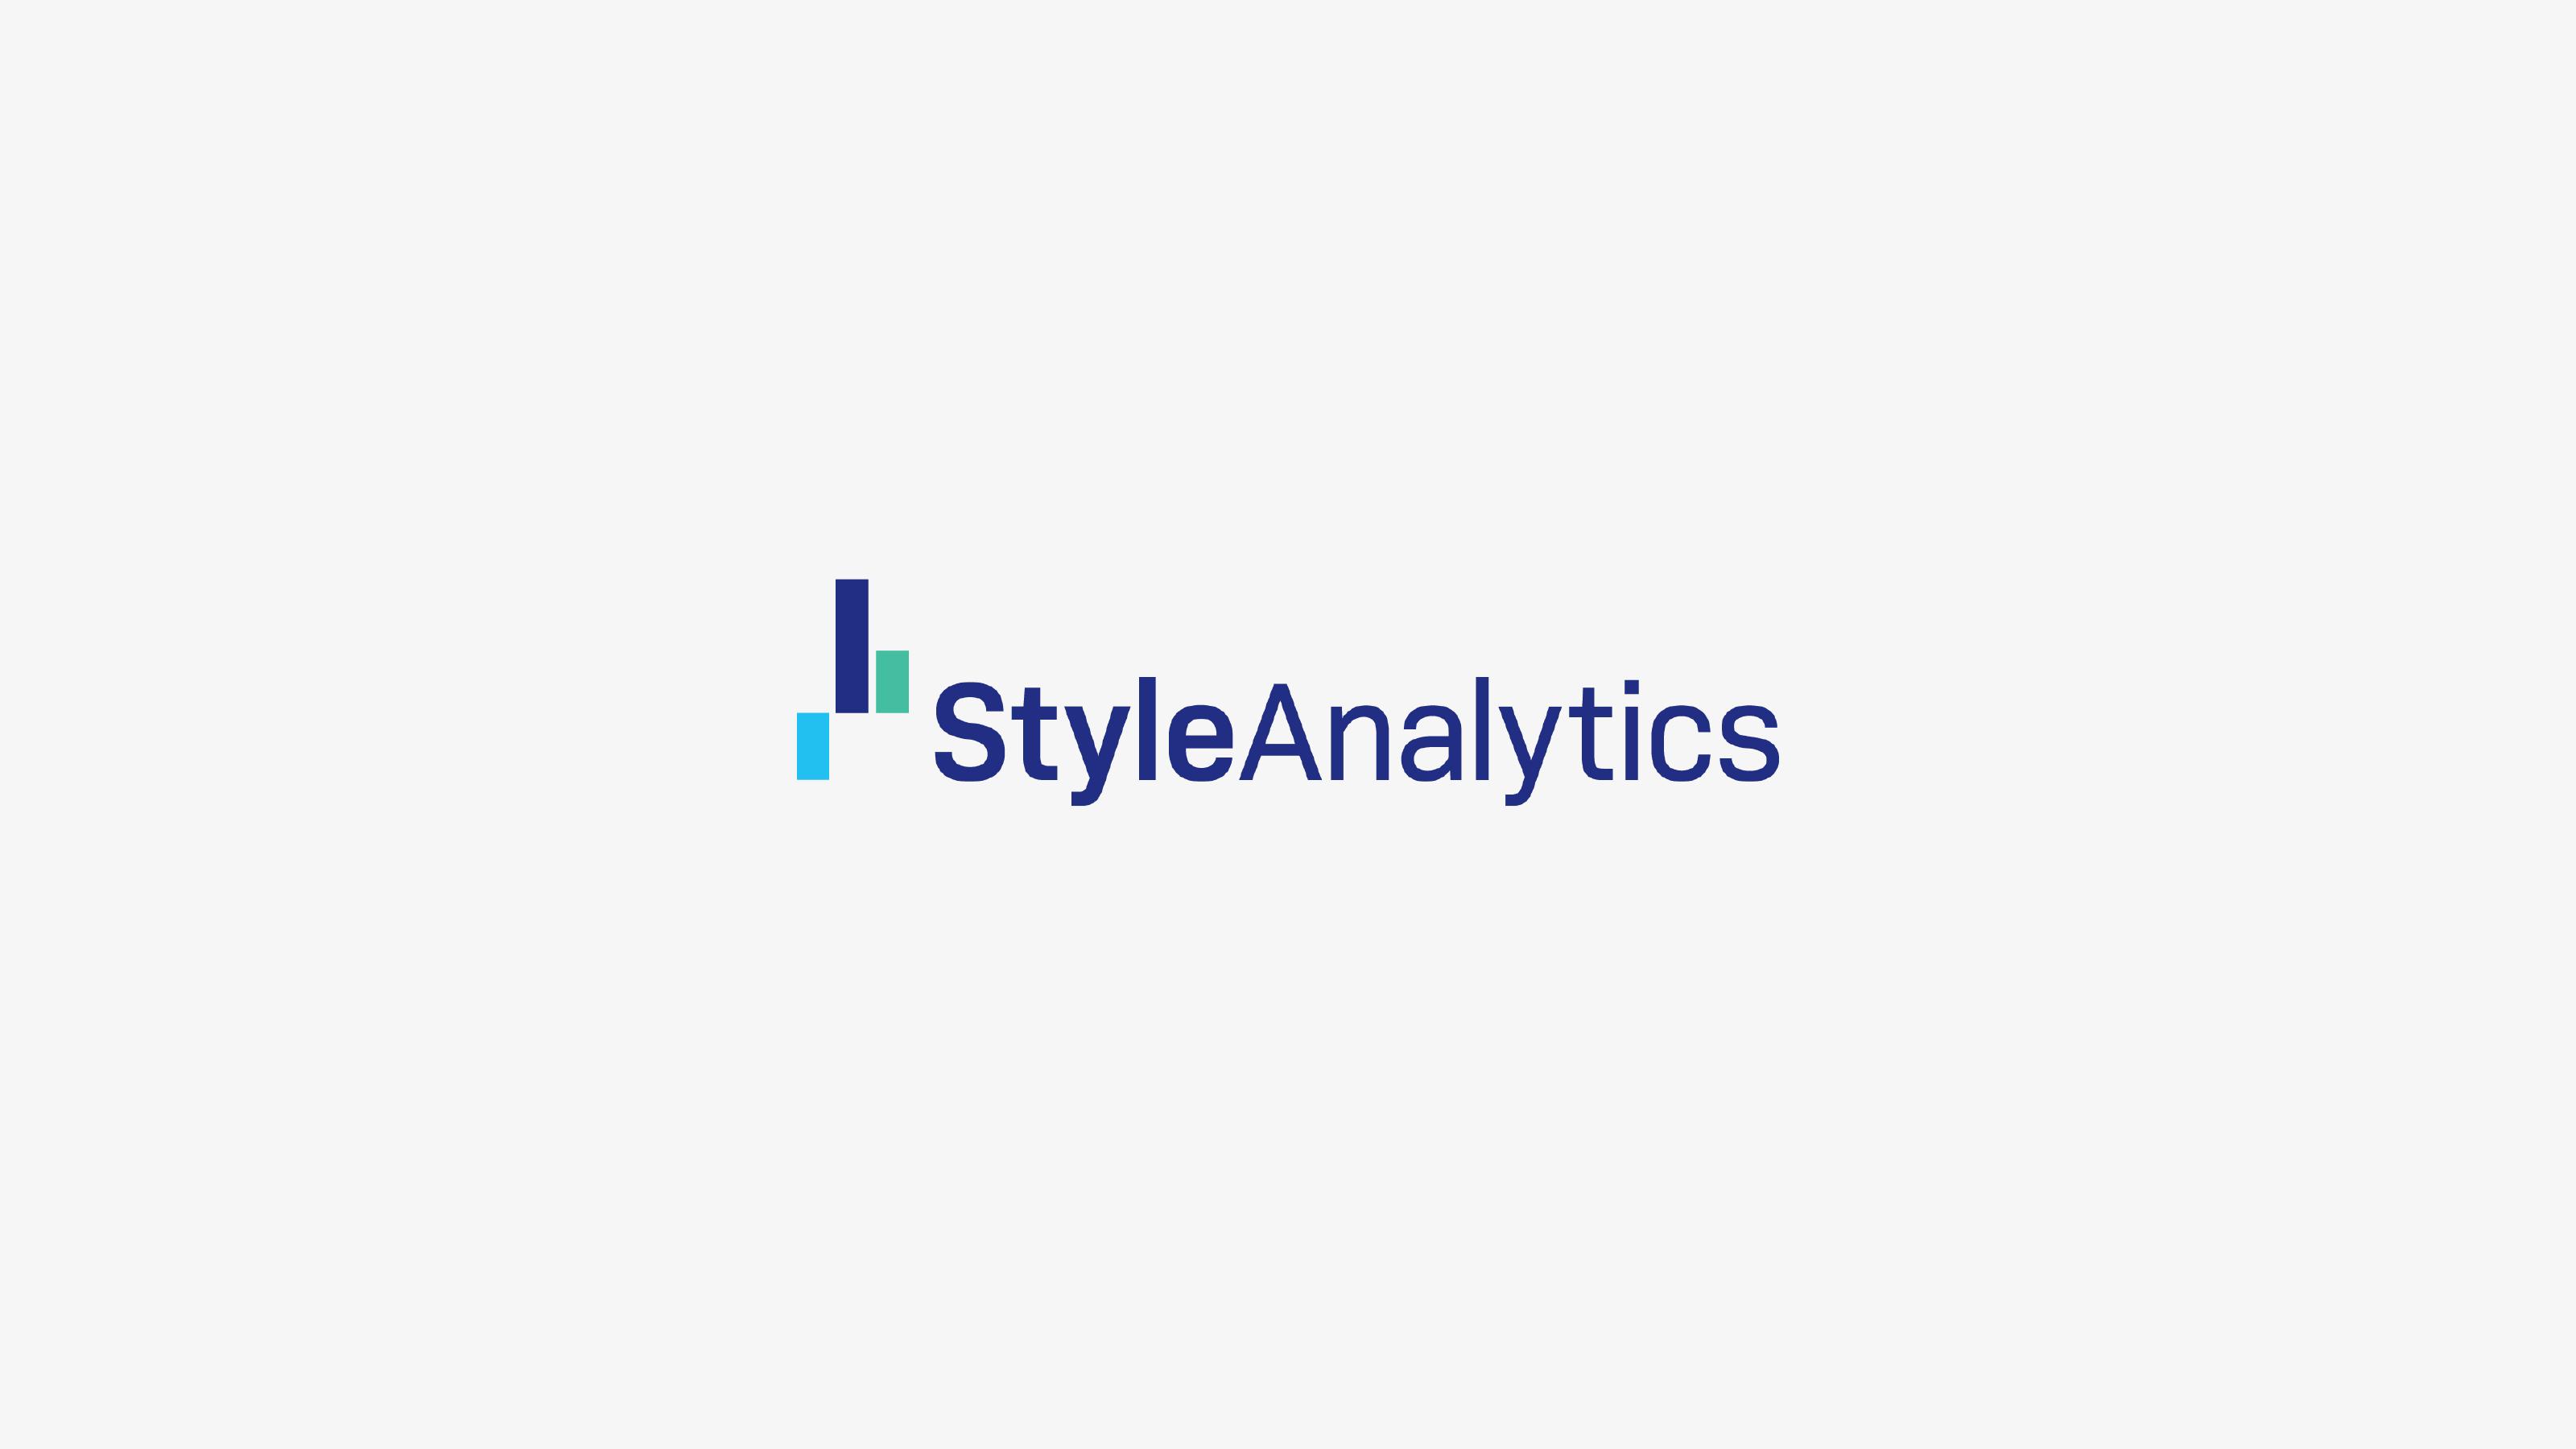 Brand logo design StyleAnalytics